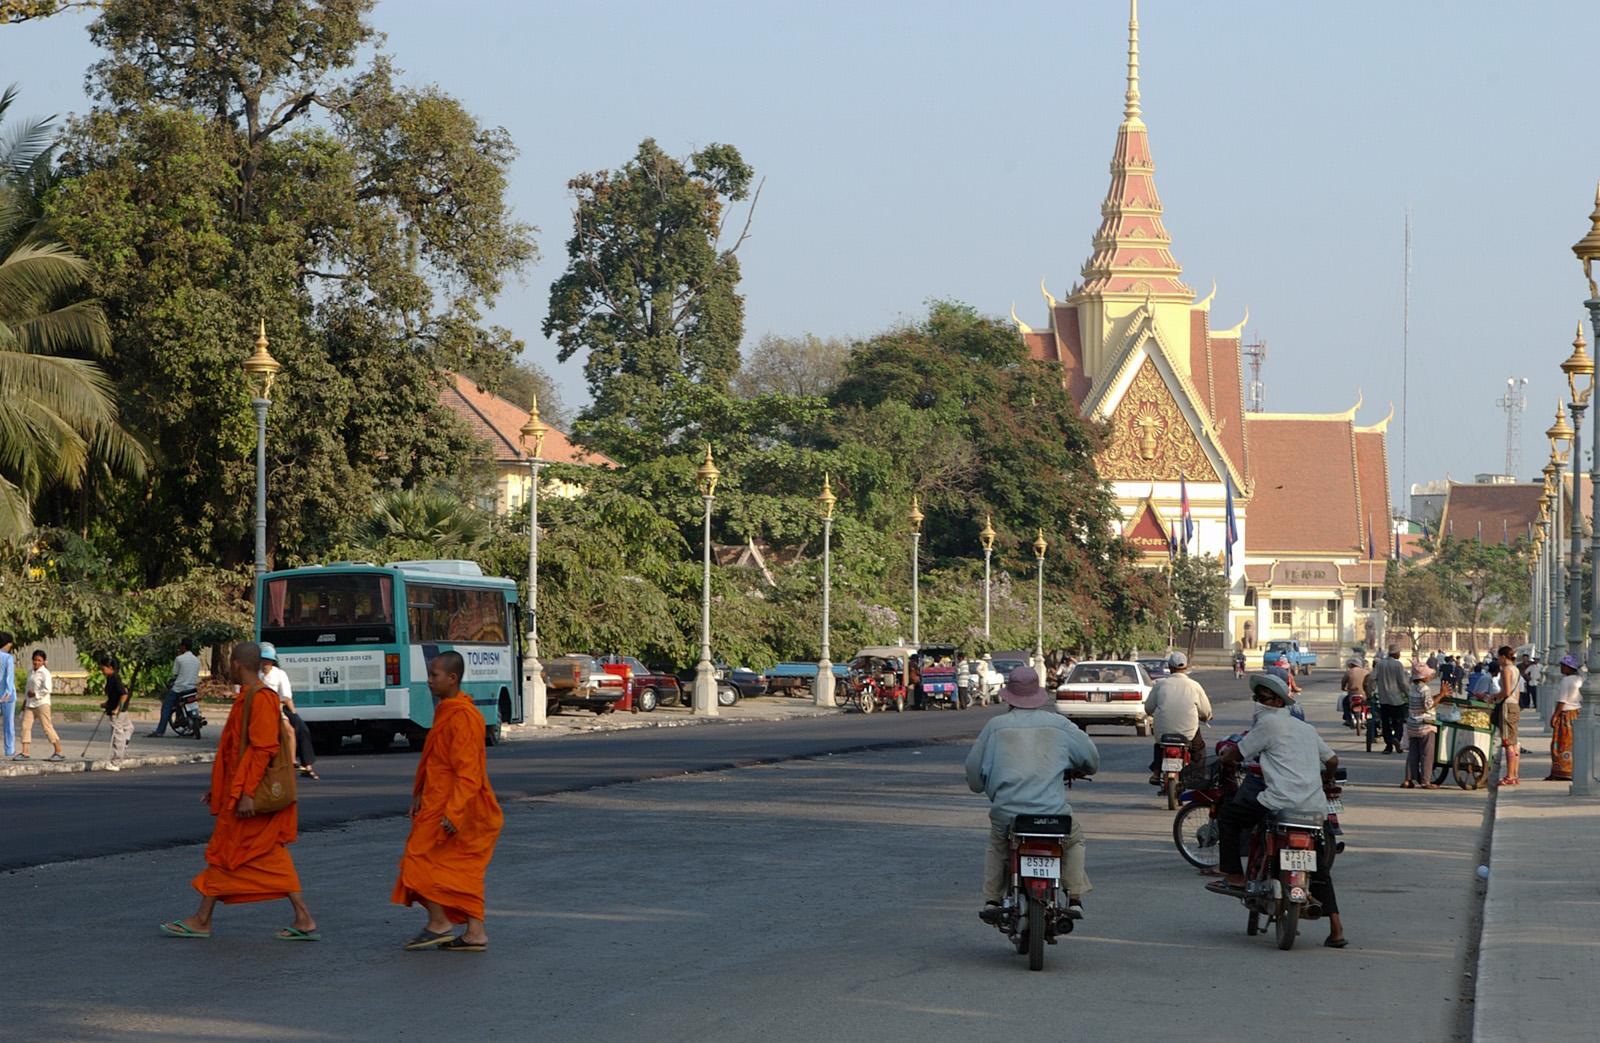 Phnom Penh April 2002 | Yatesweb  Phnom Penh Apri...